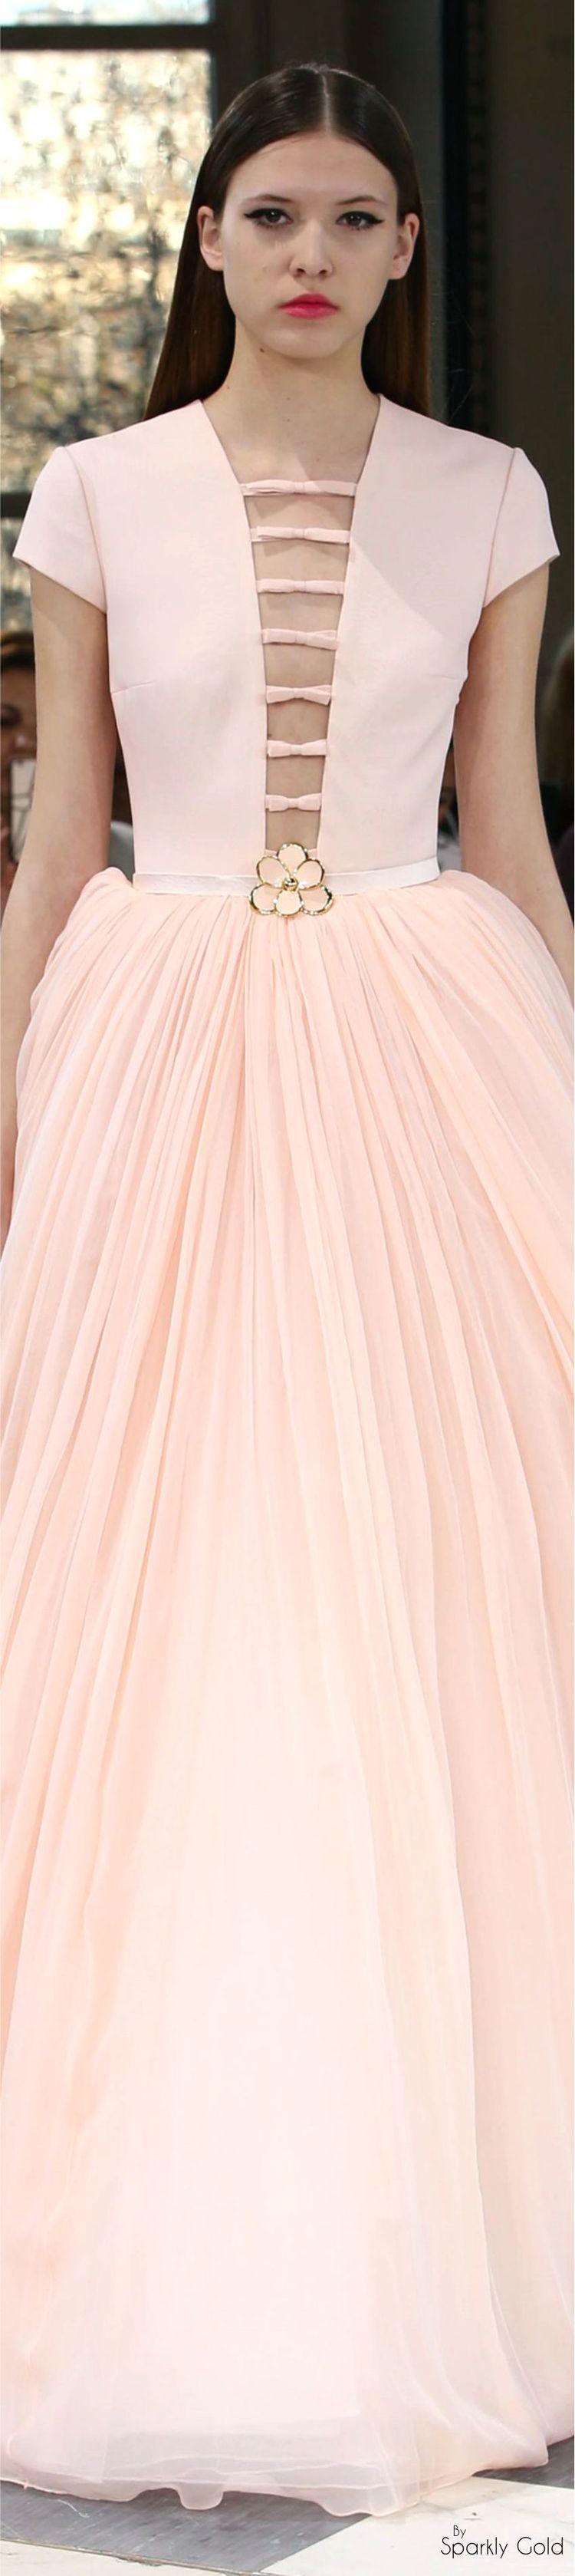 Georges Hobeika Spring 2016 Couture | ~Rose Quartz & Serenity 2016 ...